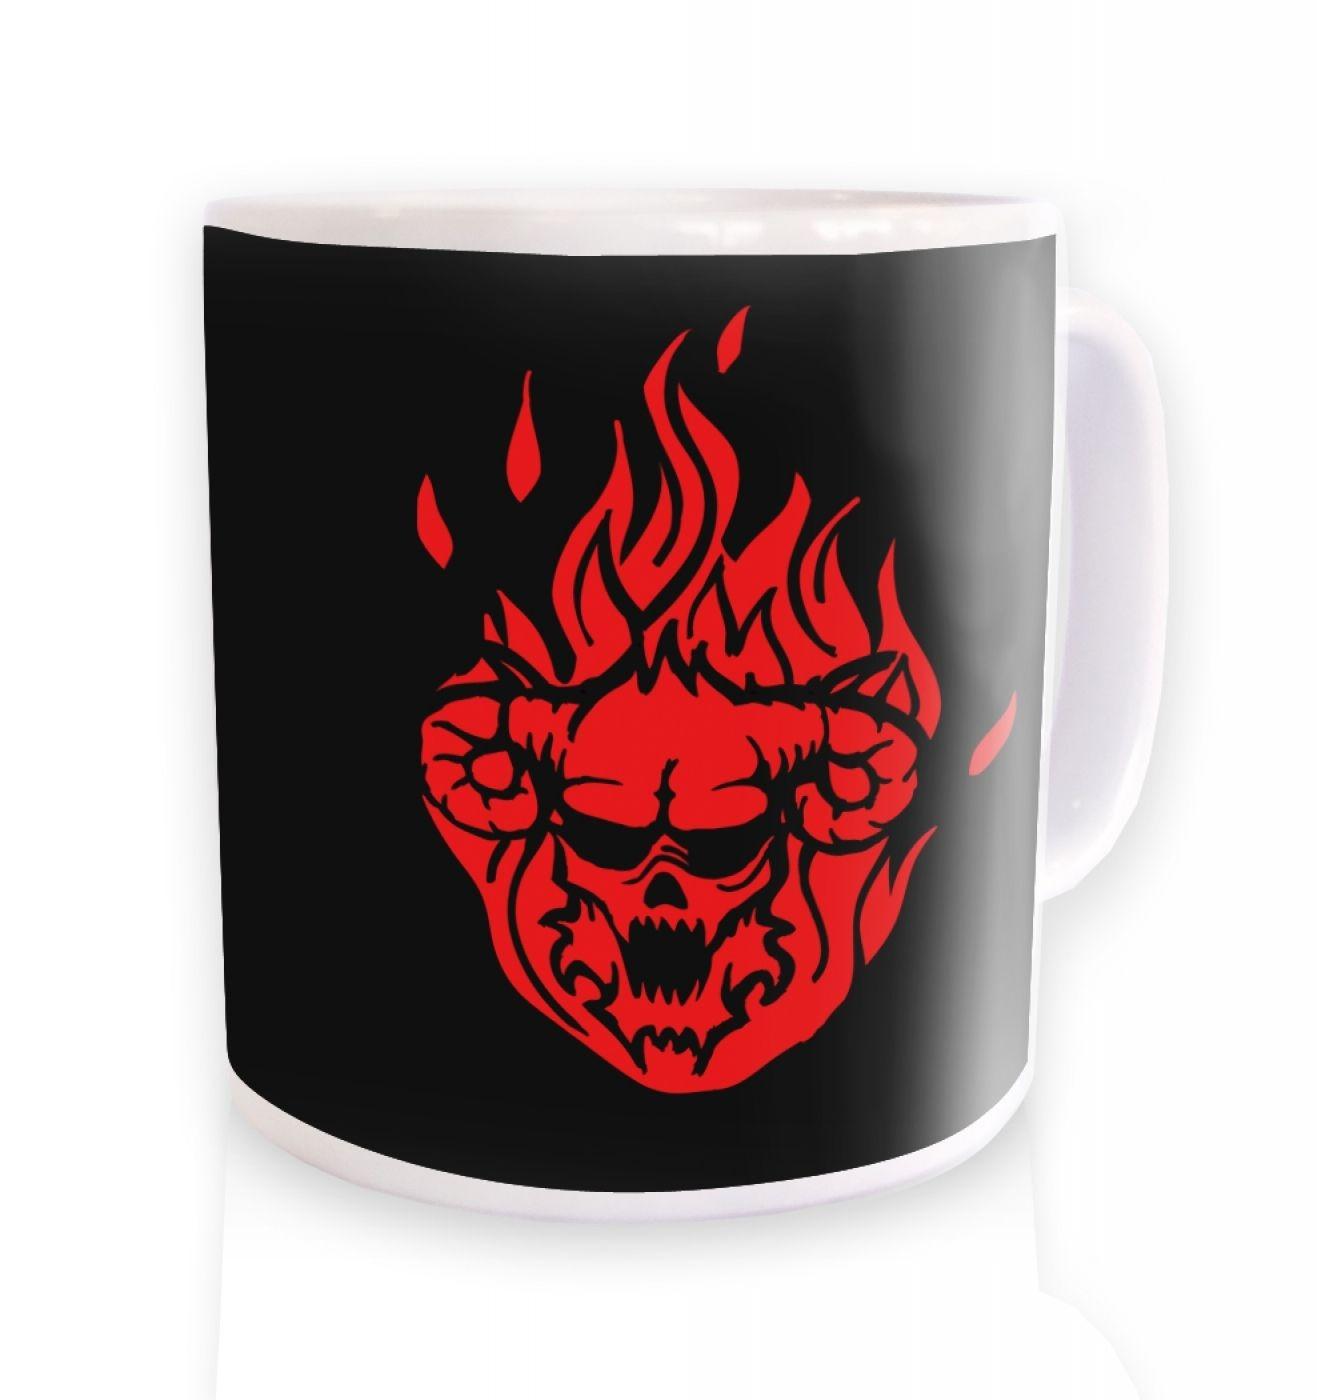 Flaming Demon's Head ceramic coffee mug